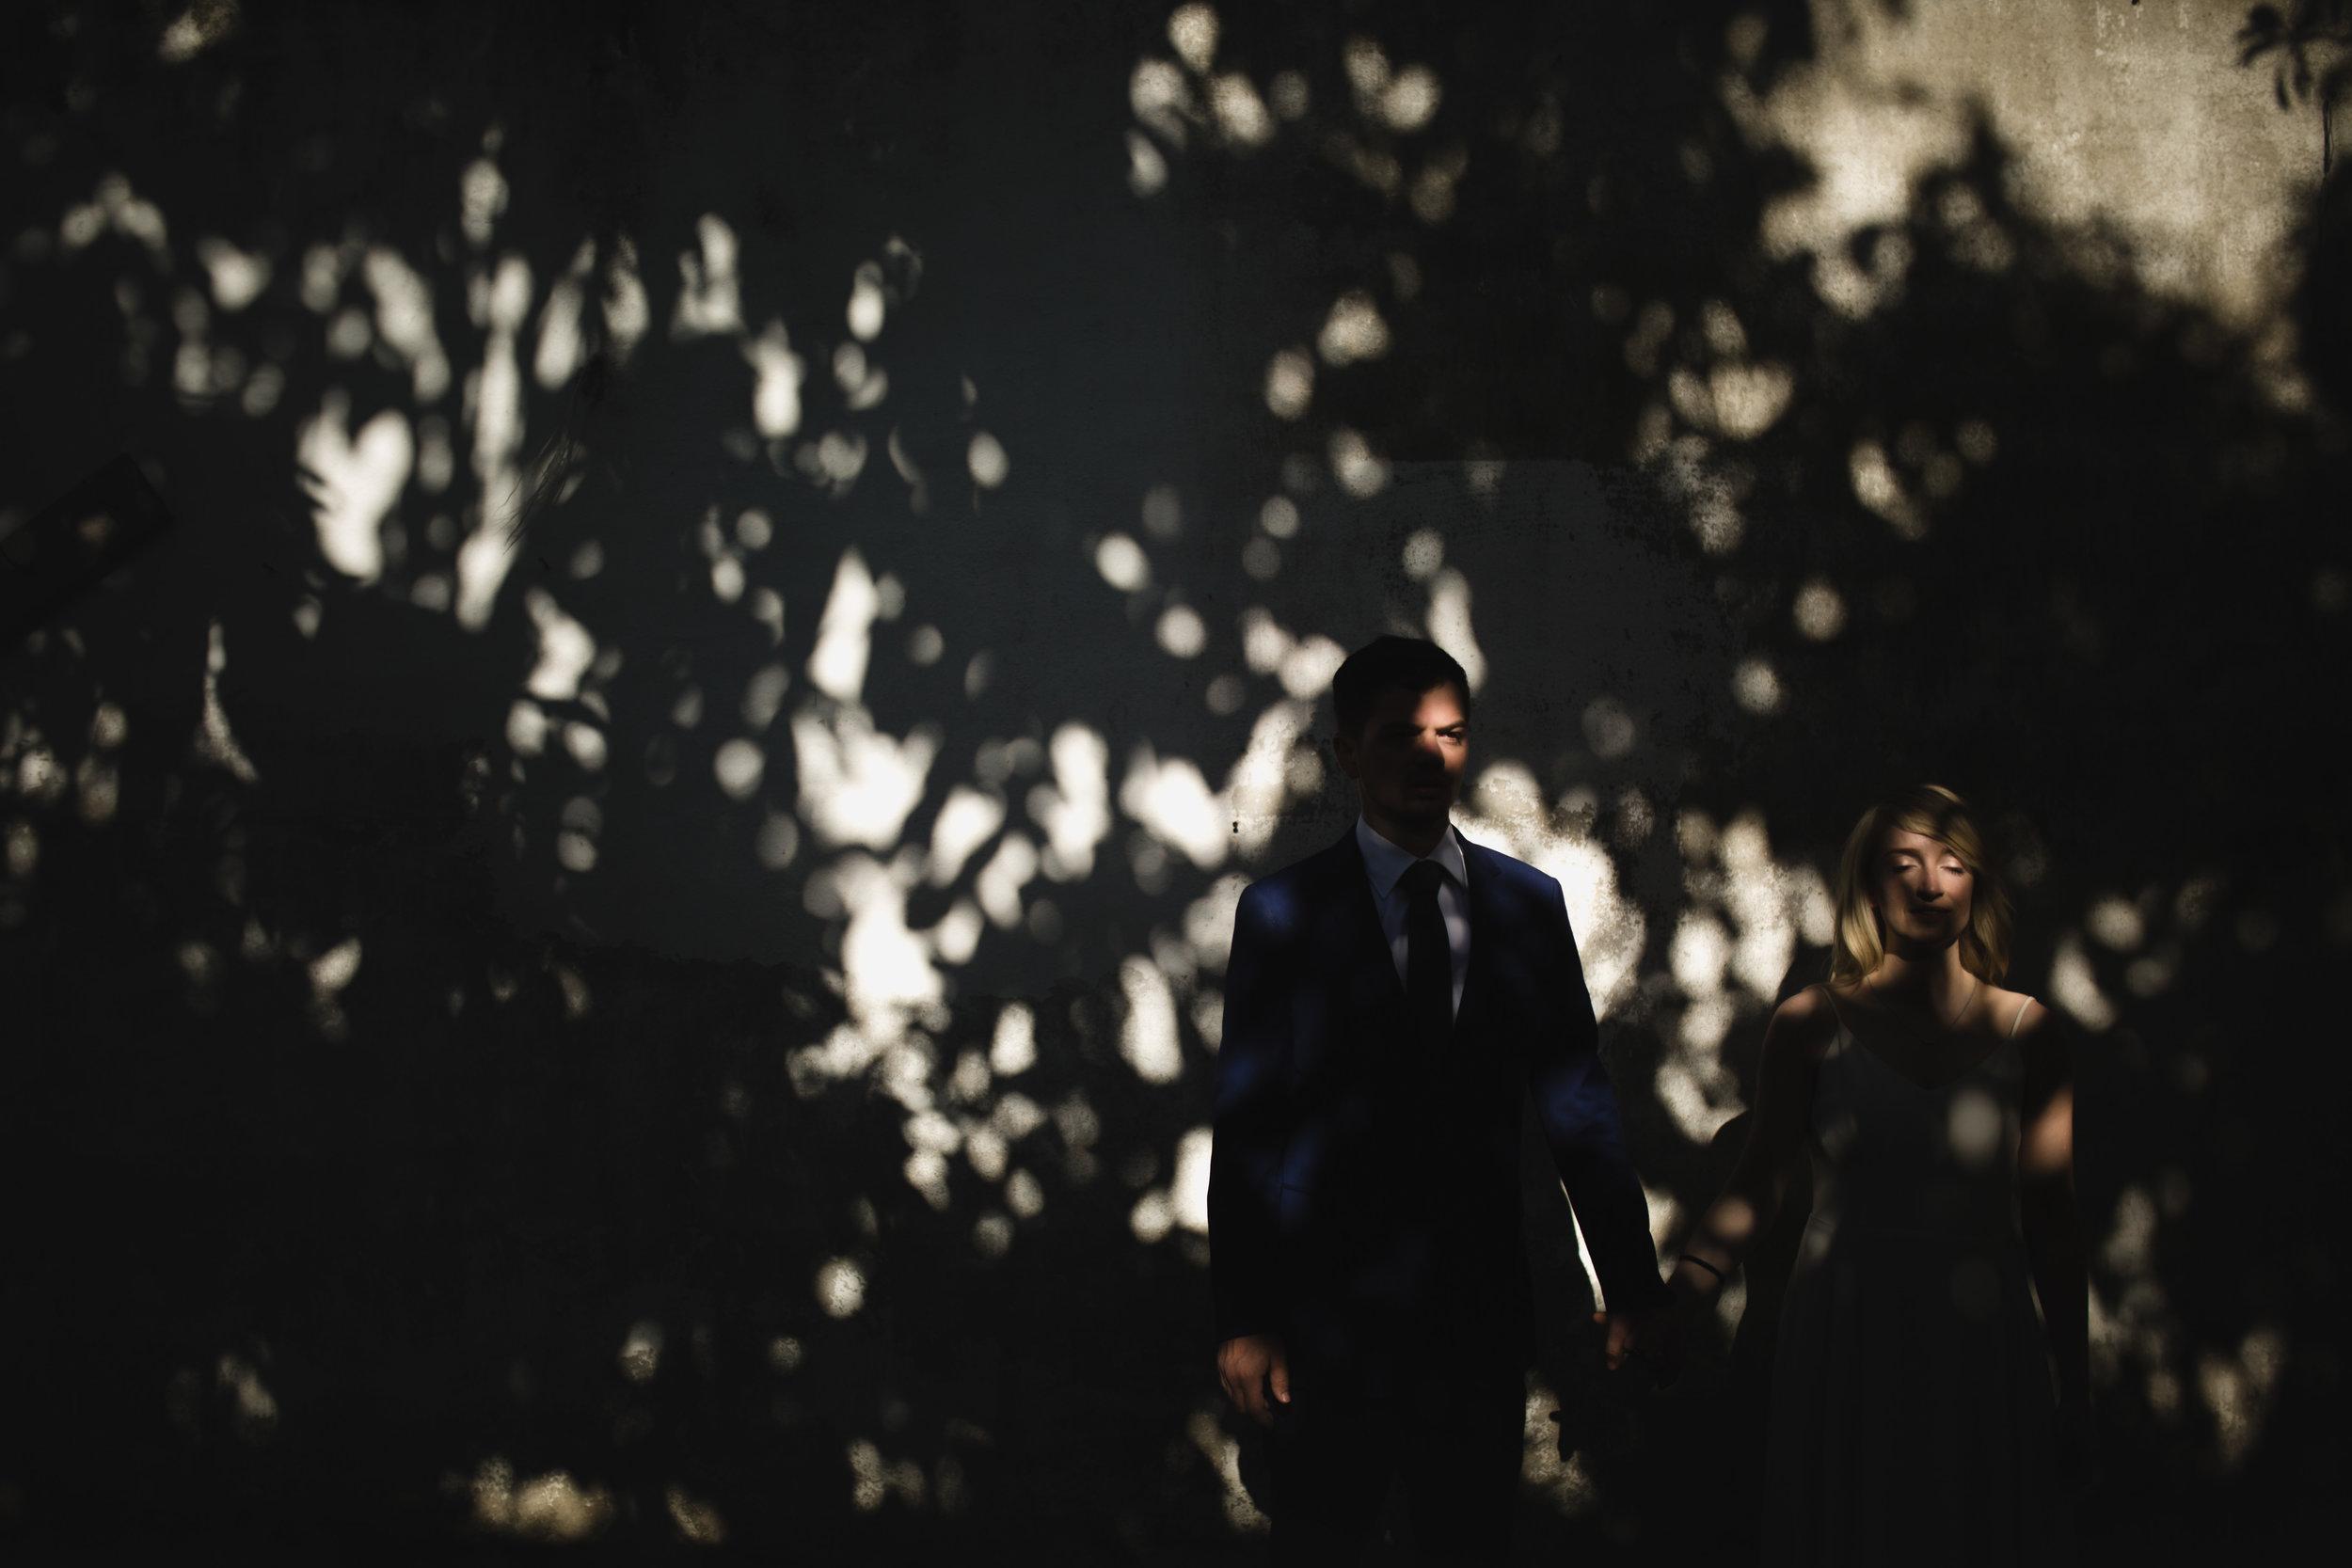 2164_Joe_&_Jenna_WEDDING.jpg